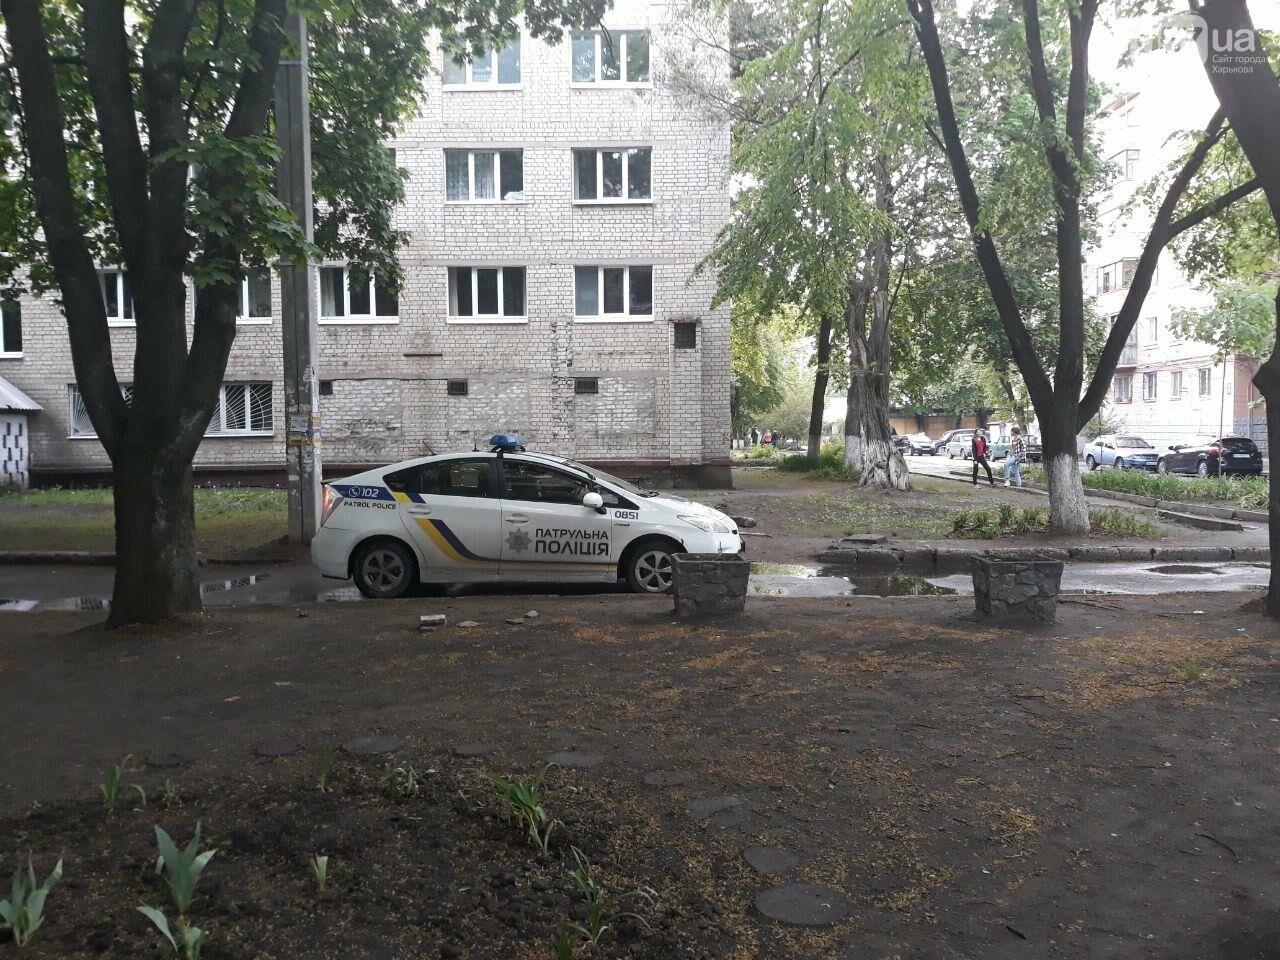 В Харькове силовики оцепили «пятиэтажку» и искали взрывчатку, - ФОТО, фото-5